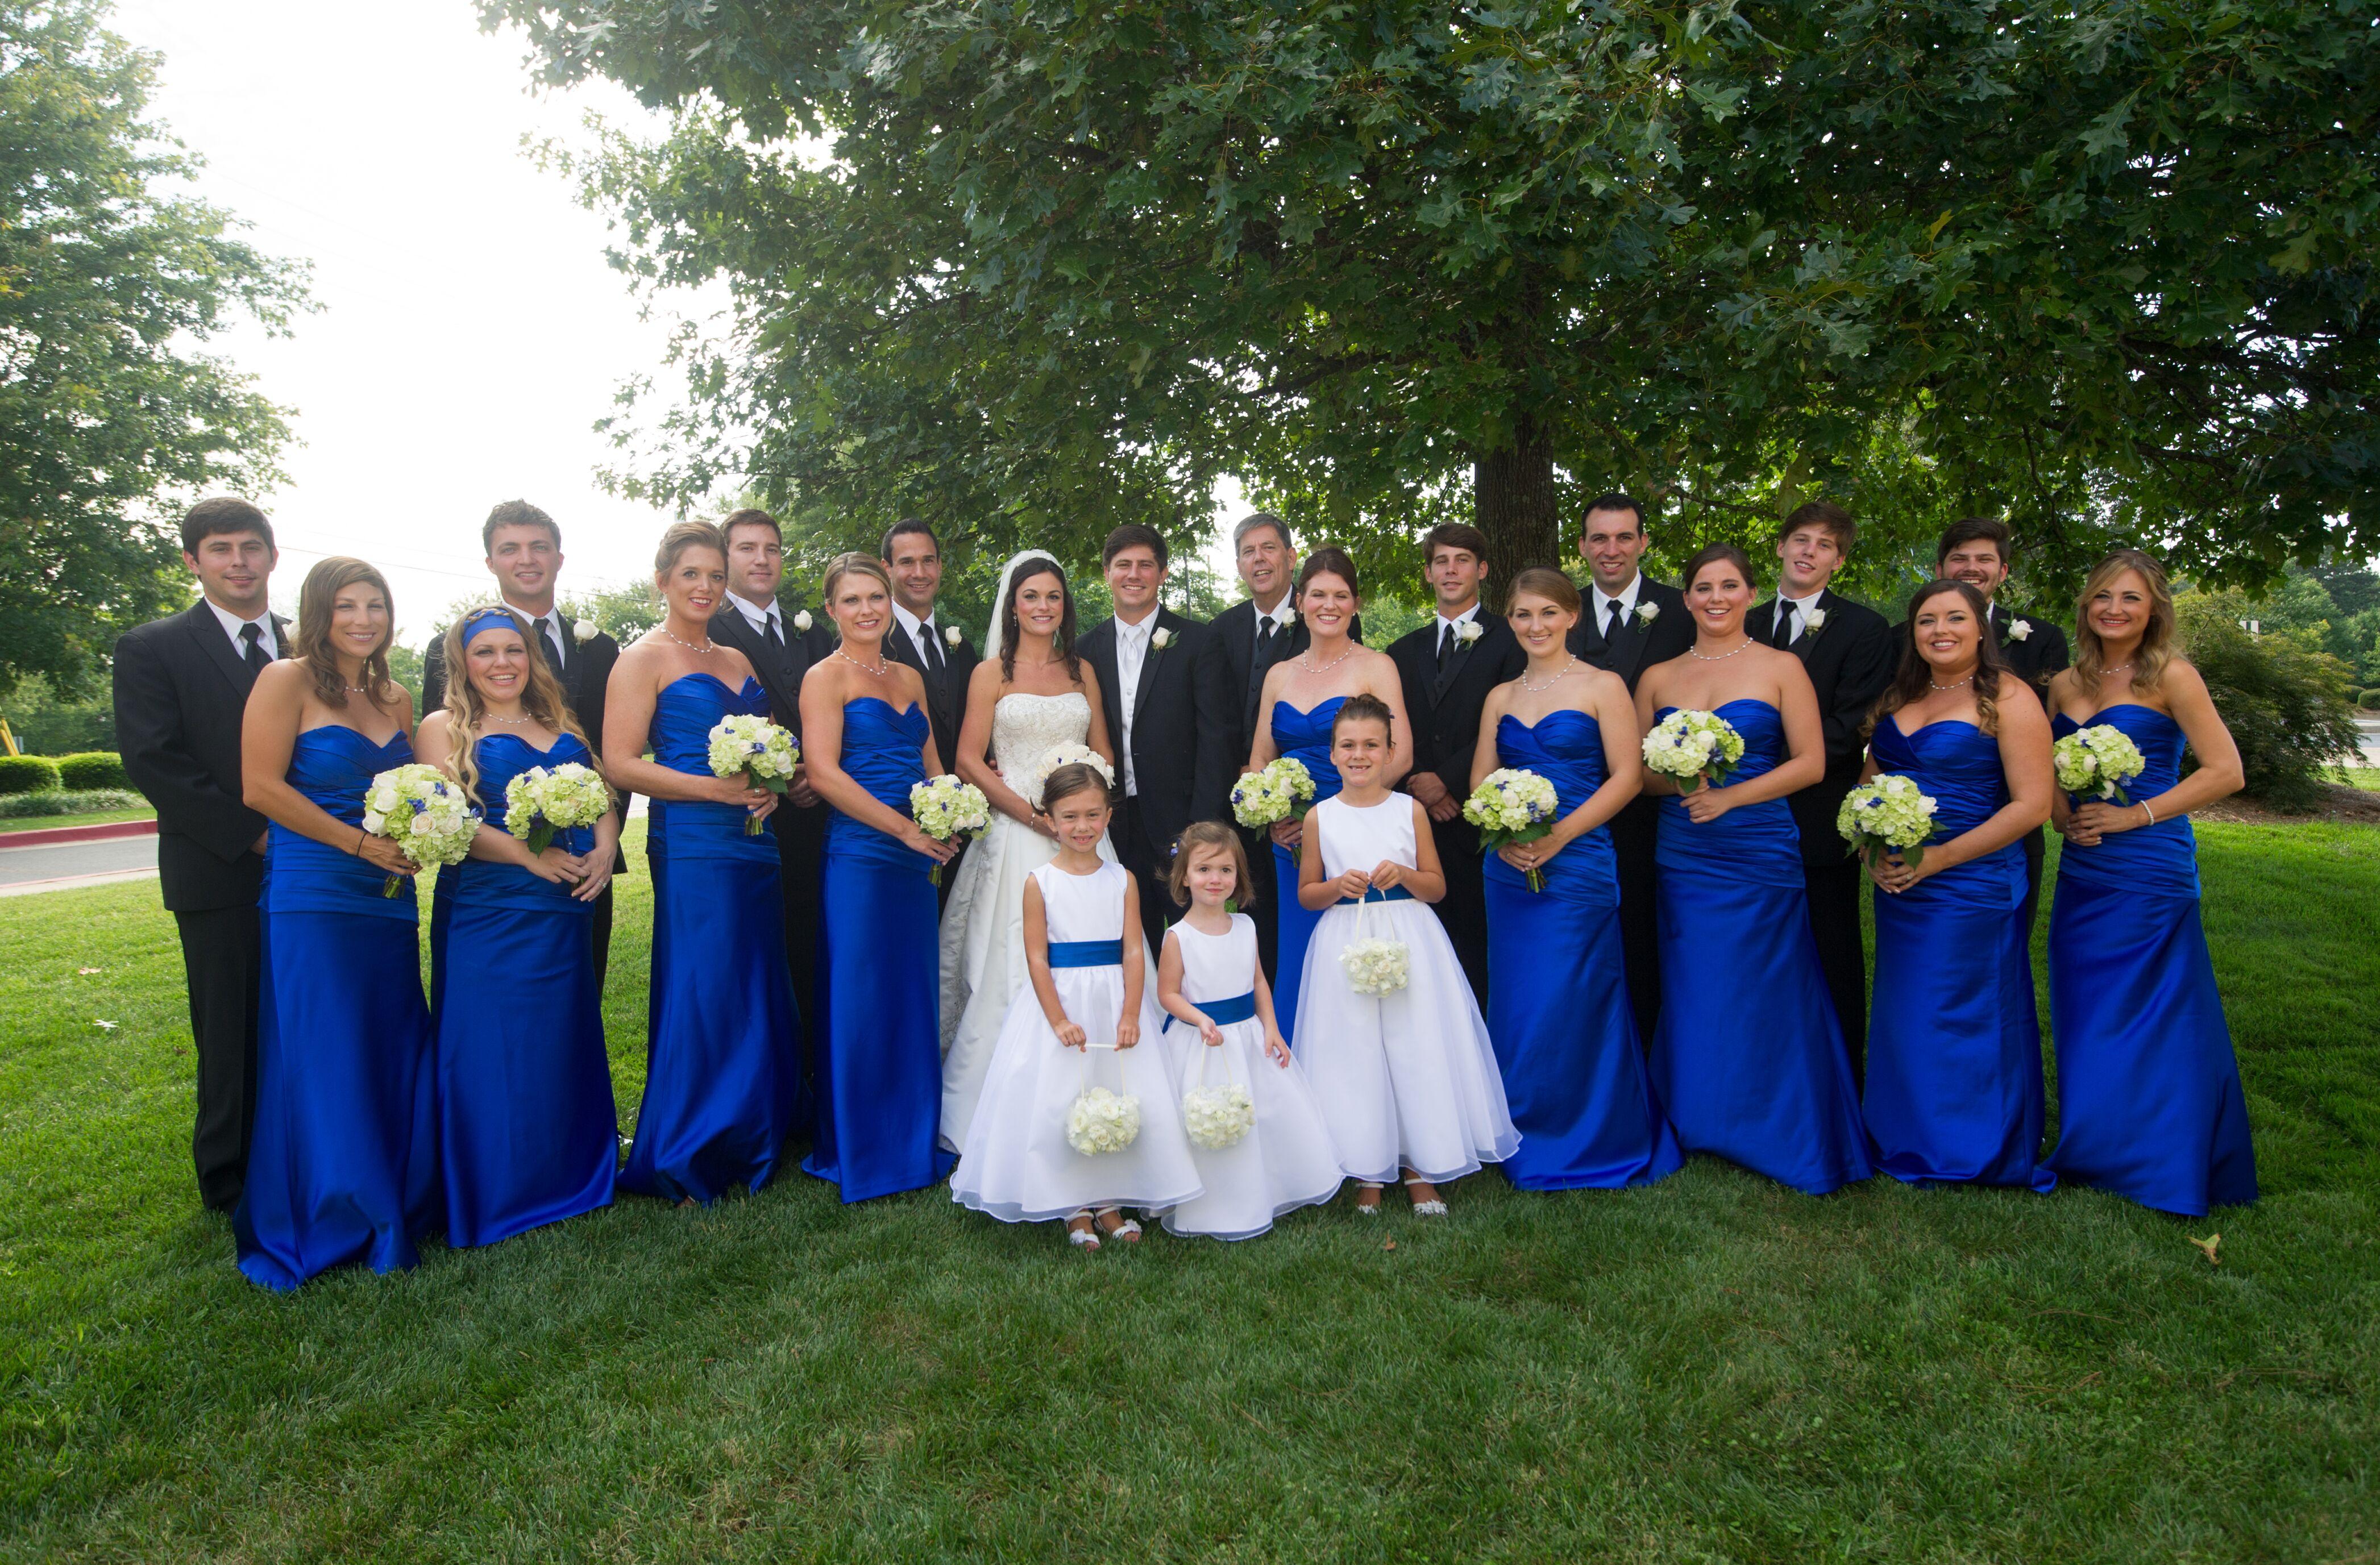 Long Satin Cobalt Blue Bridesmaid Dresses